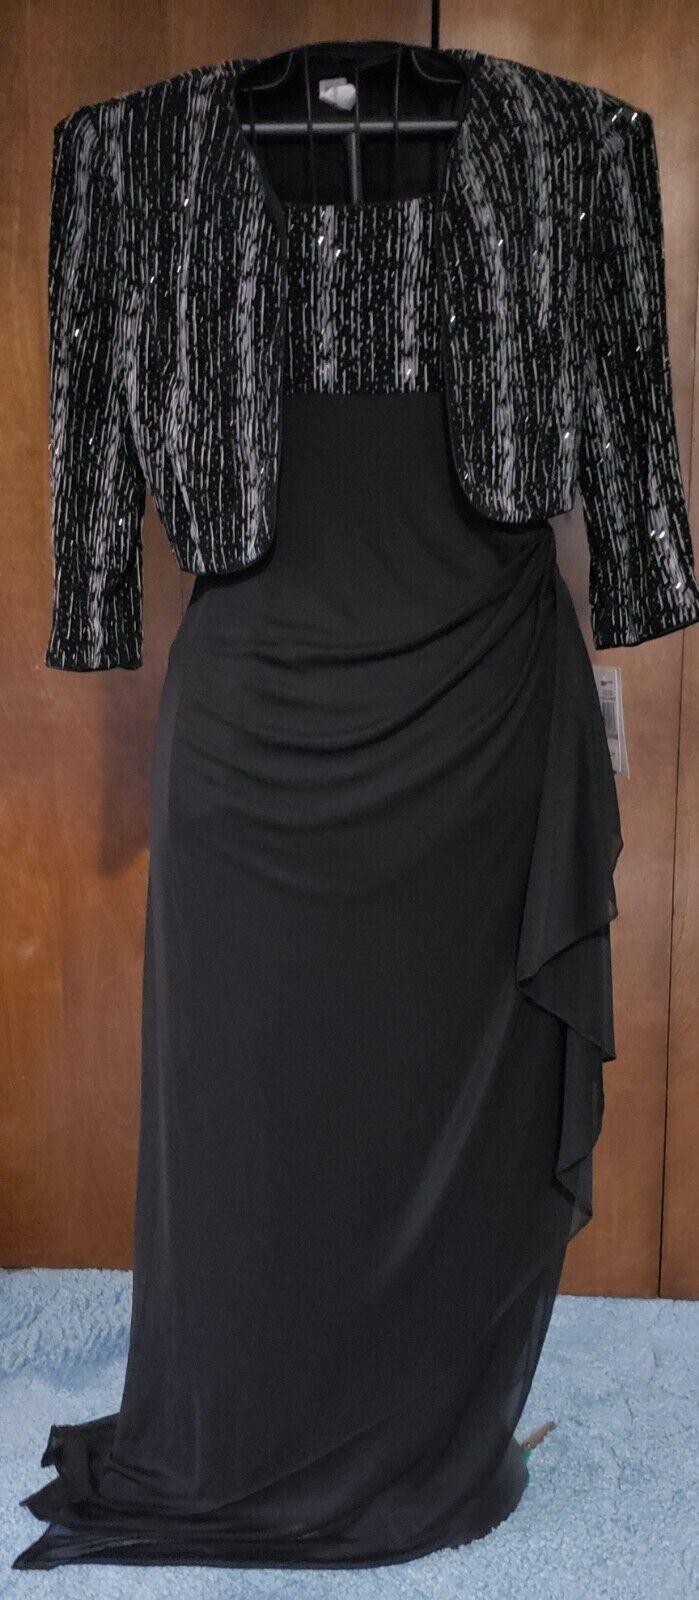 MK OFFE**retail Wedding Prom Dress SZ 12 2pc Jacket Dress ALEX EVENINGS